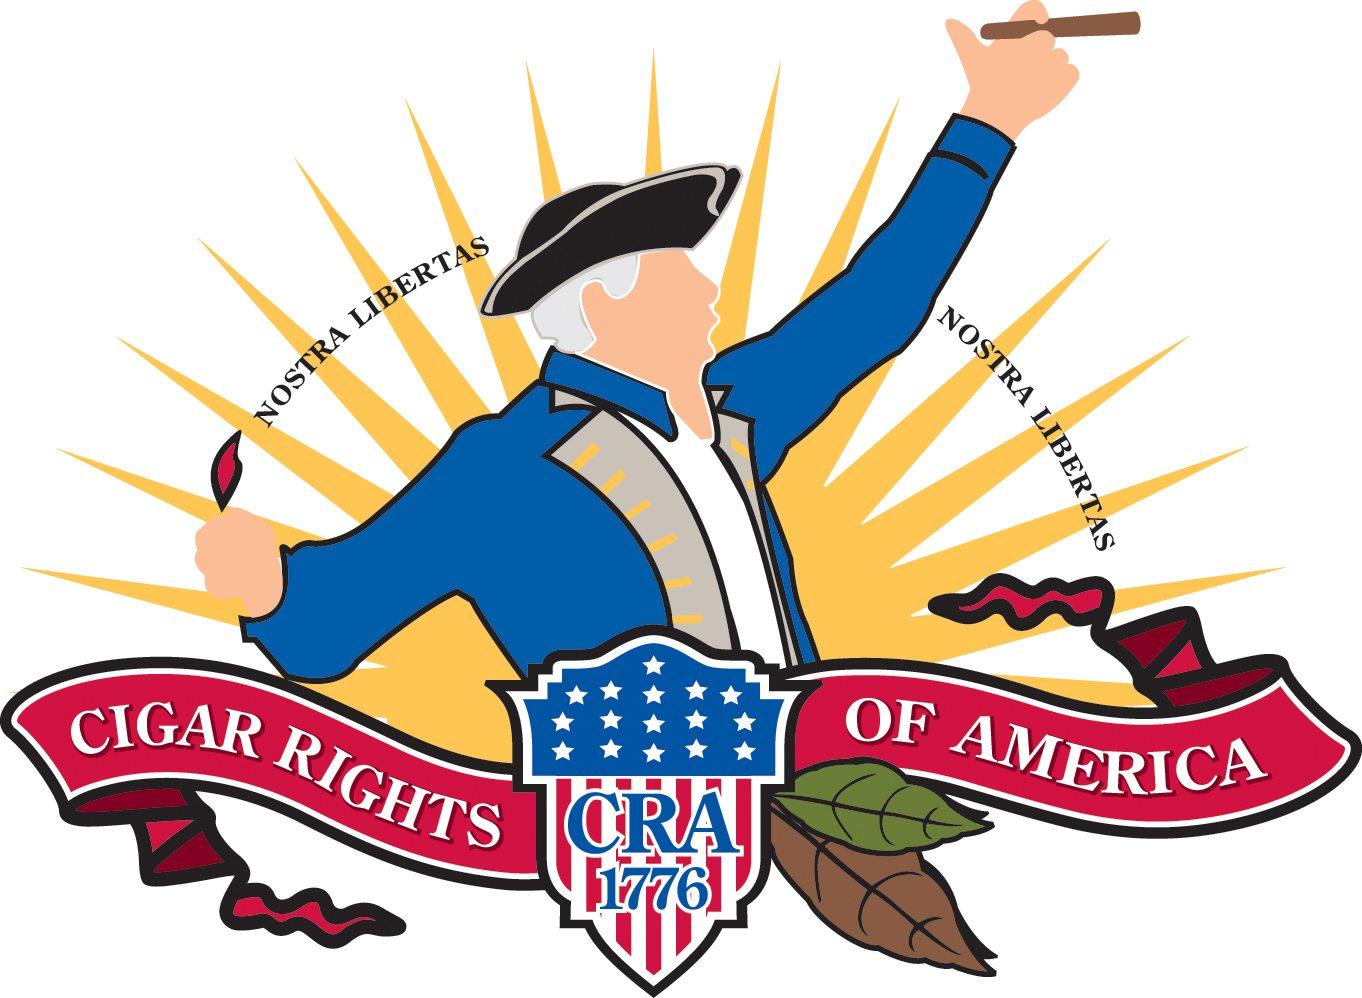 Cigar News: Cigar Industry Files for Summary Judgment on FDA's Final Deeming Rule